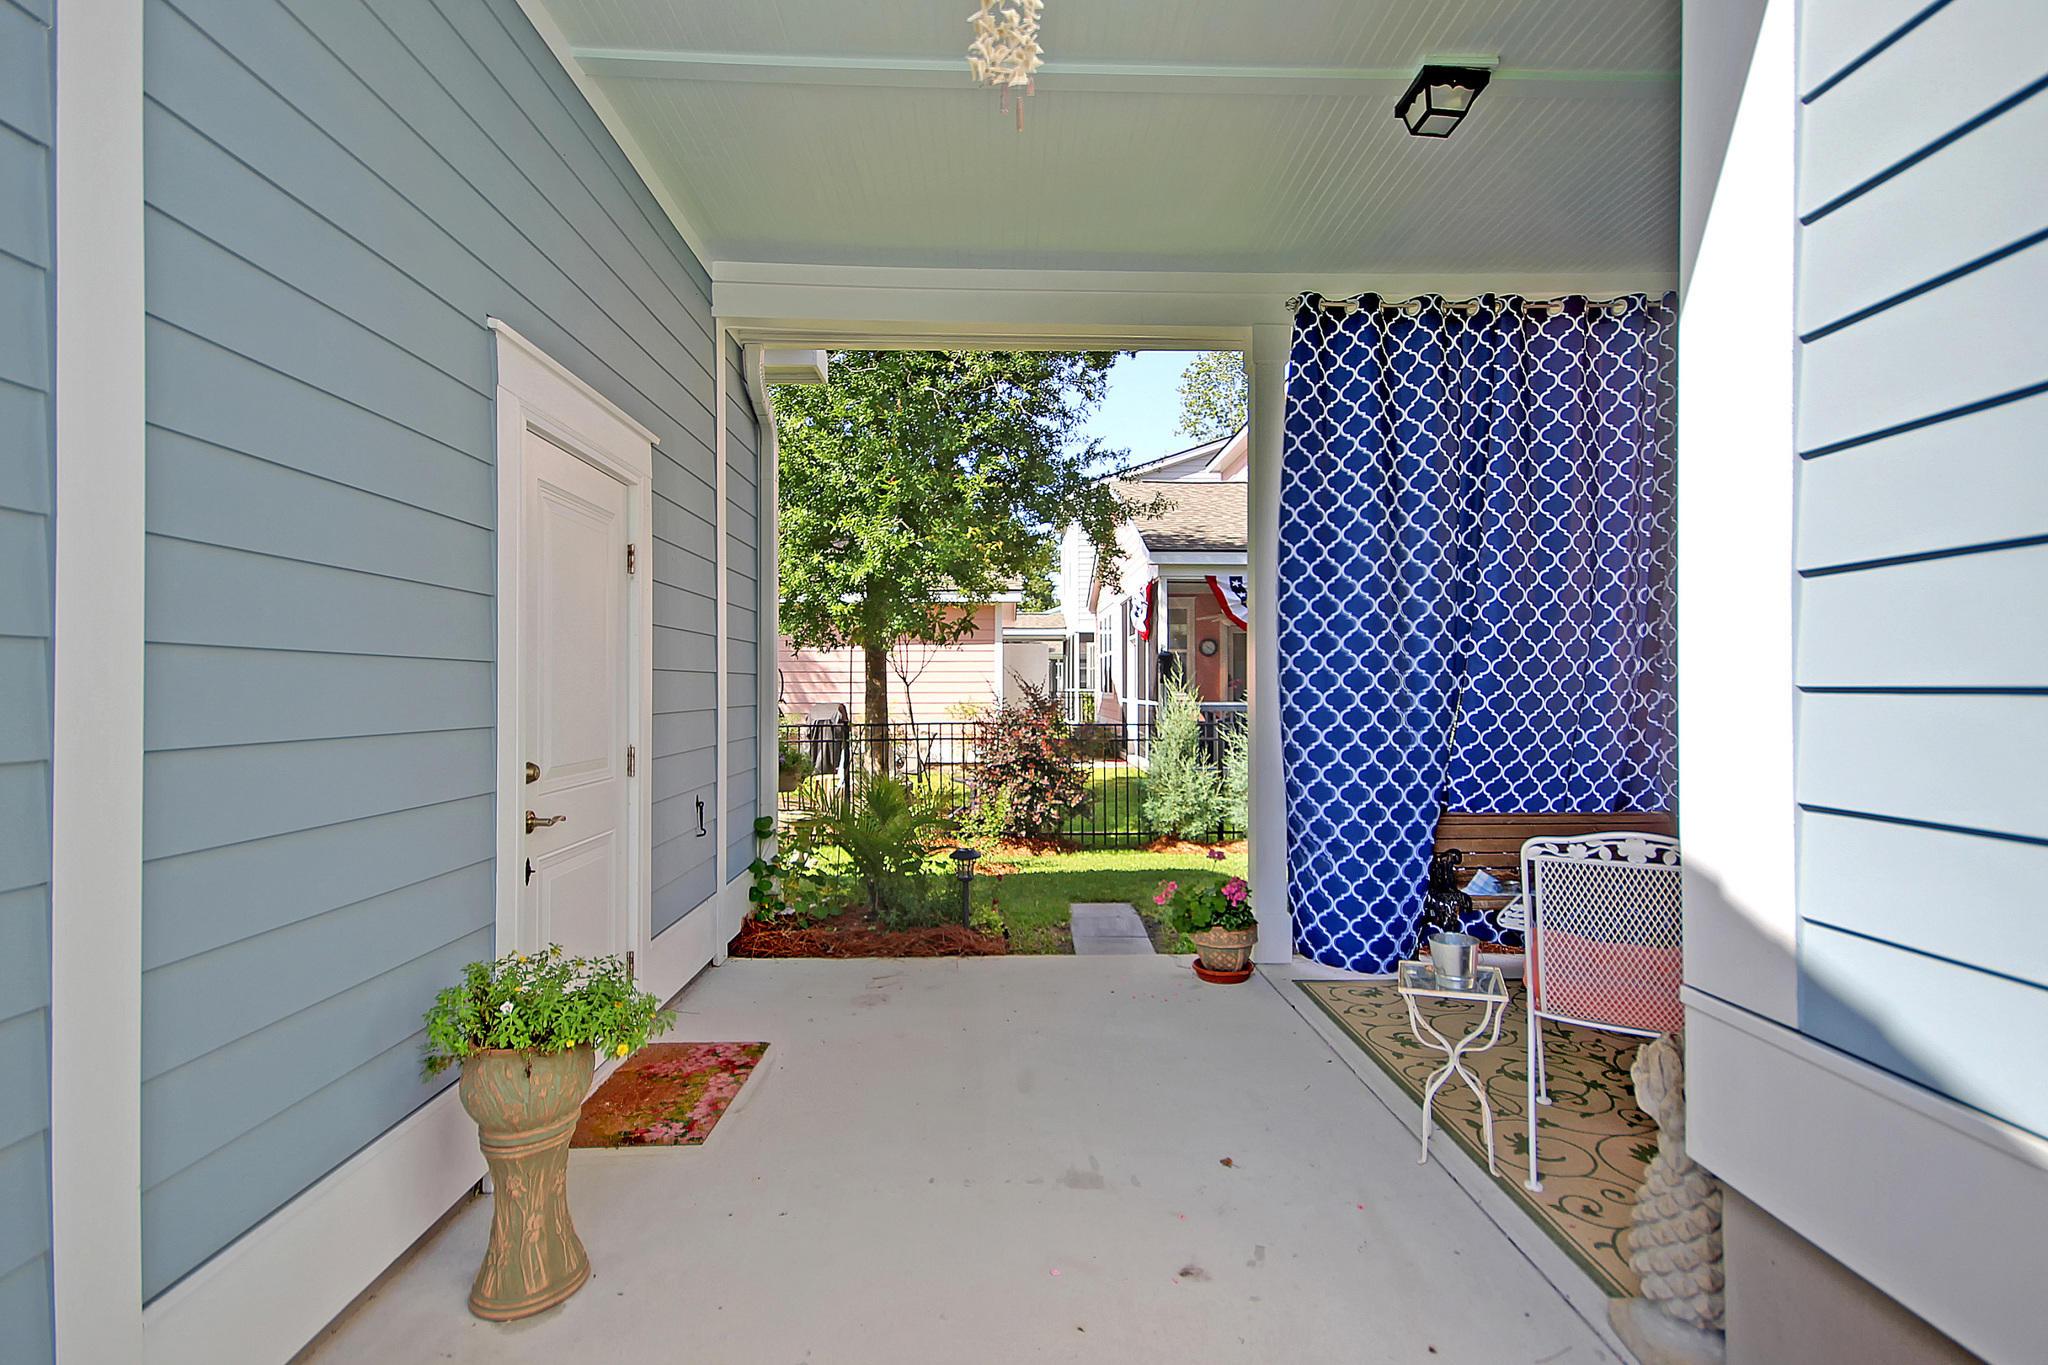 713 N Hickory Street Summerville, SC 29483